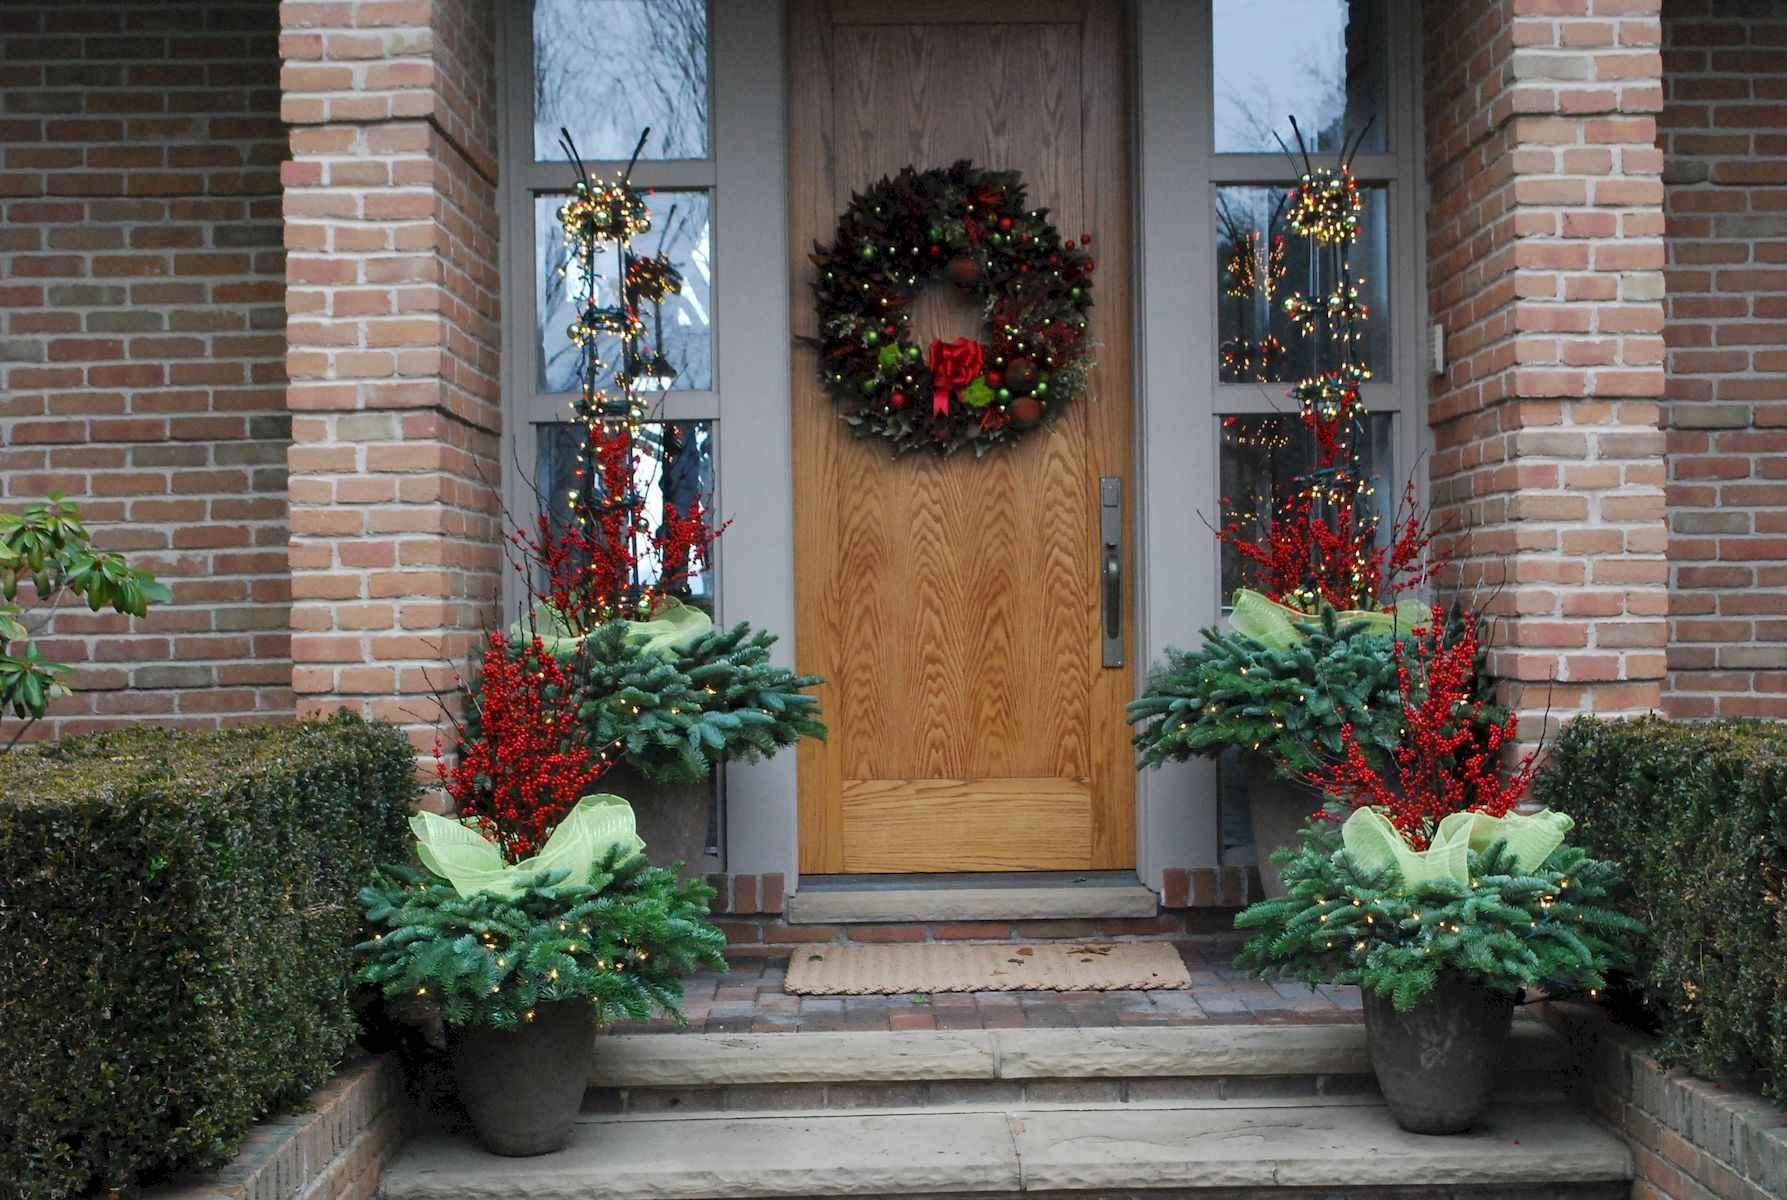 40 amazing outdoor christmas decorations ideas (21)